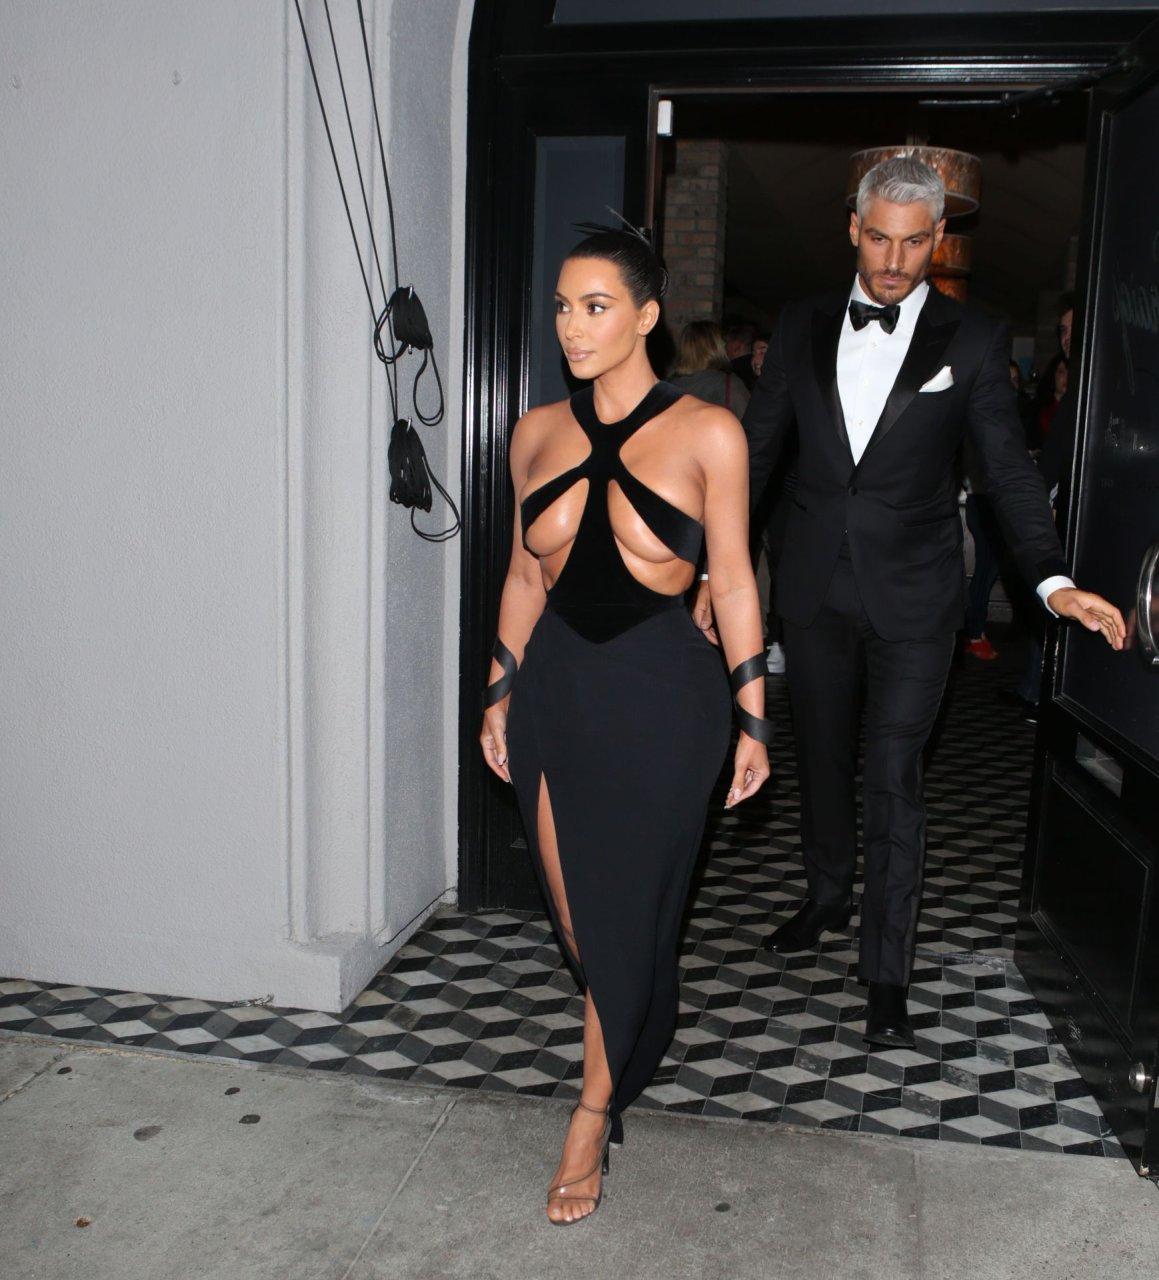 Kim-Kardashian-Topless-TheFappeningBlog.com-7.jpg